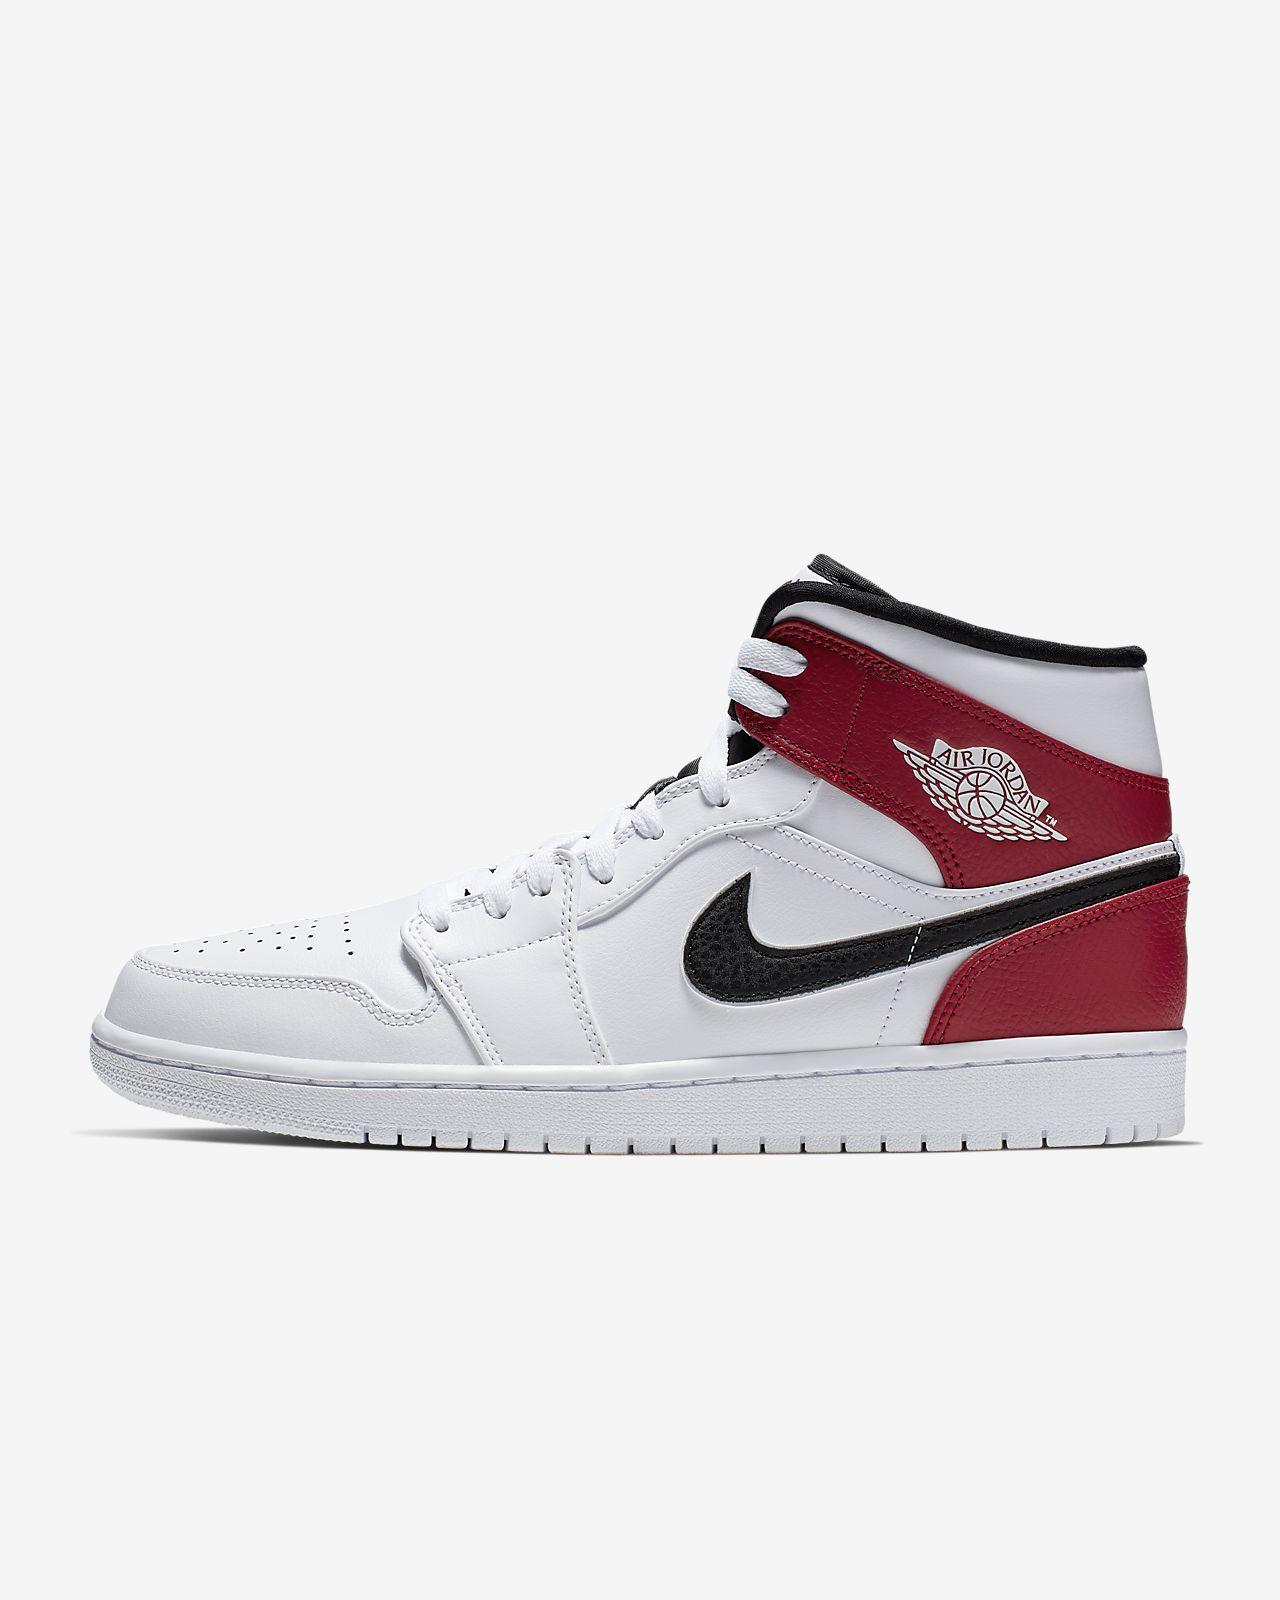 52e997631692 Chaussure Air Jordan 1 Mid pour Homme. Nike.com FR